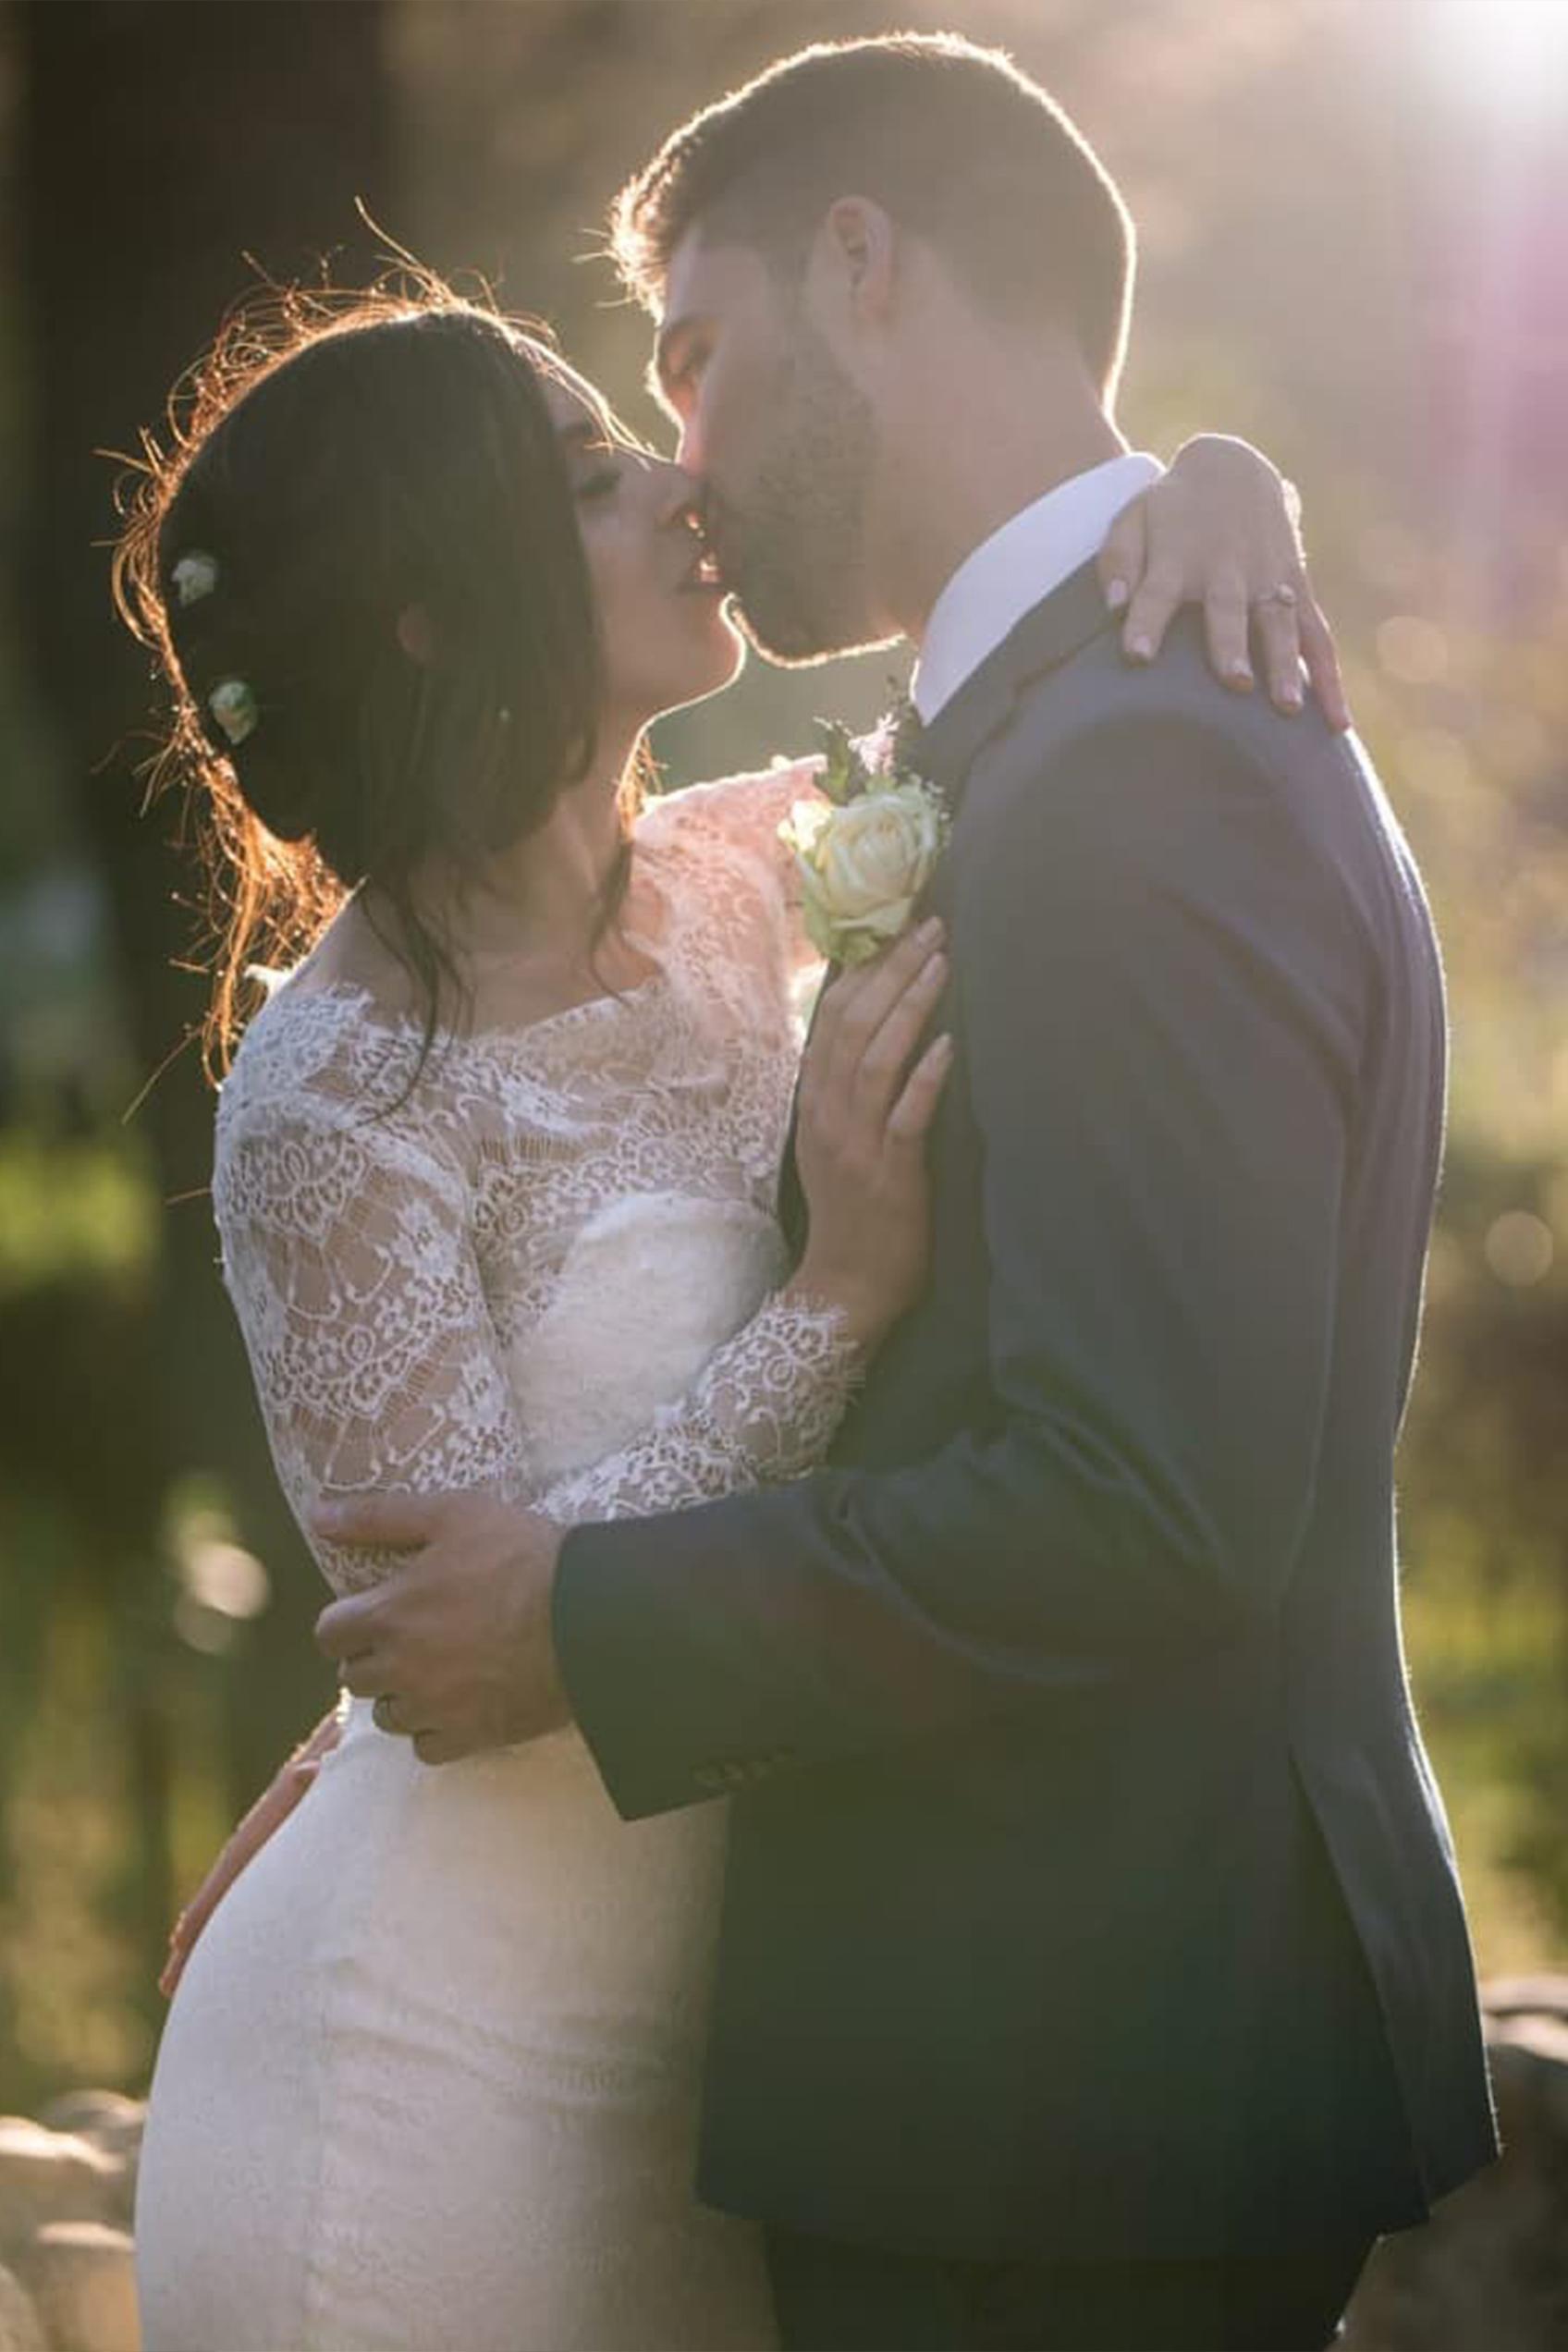 Valencia Harrison Designs - Wedding Dresses Cape Town